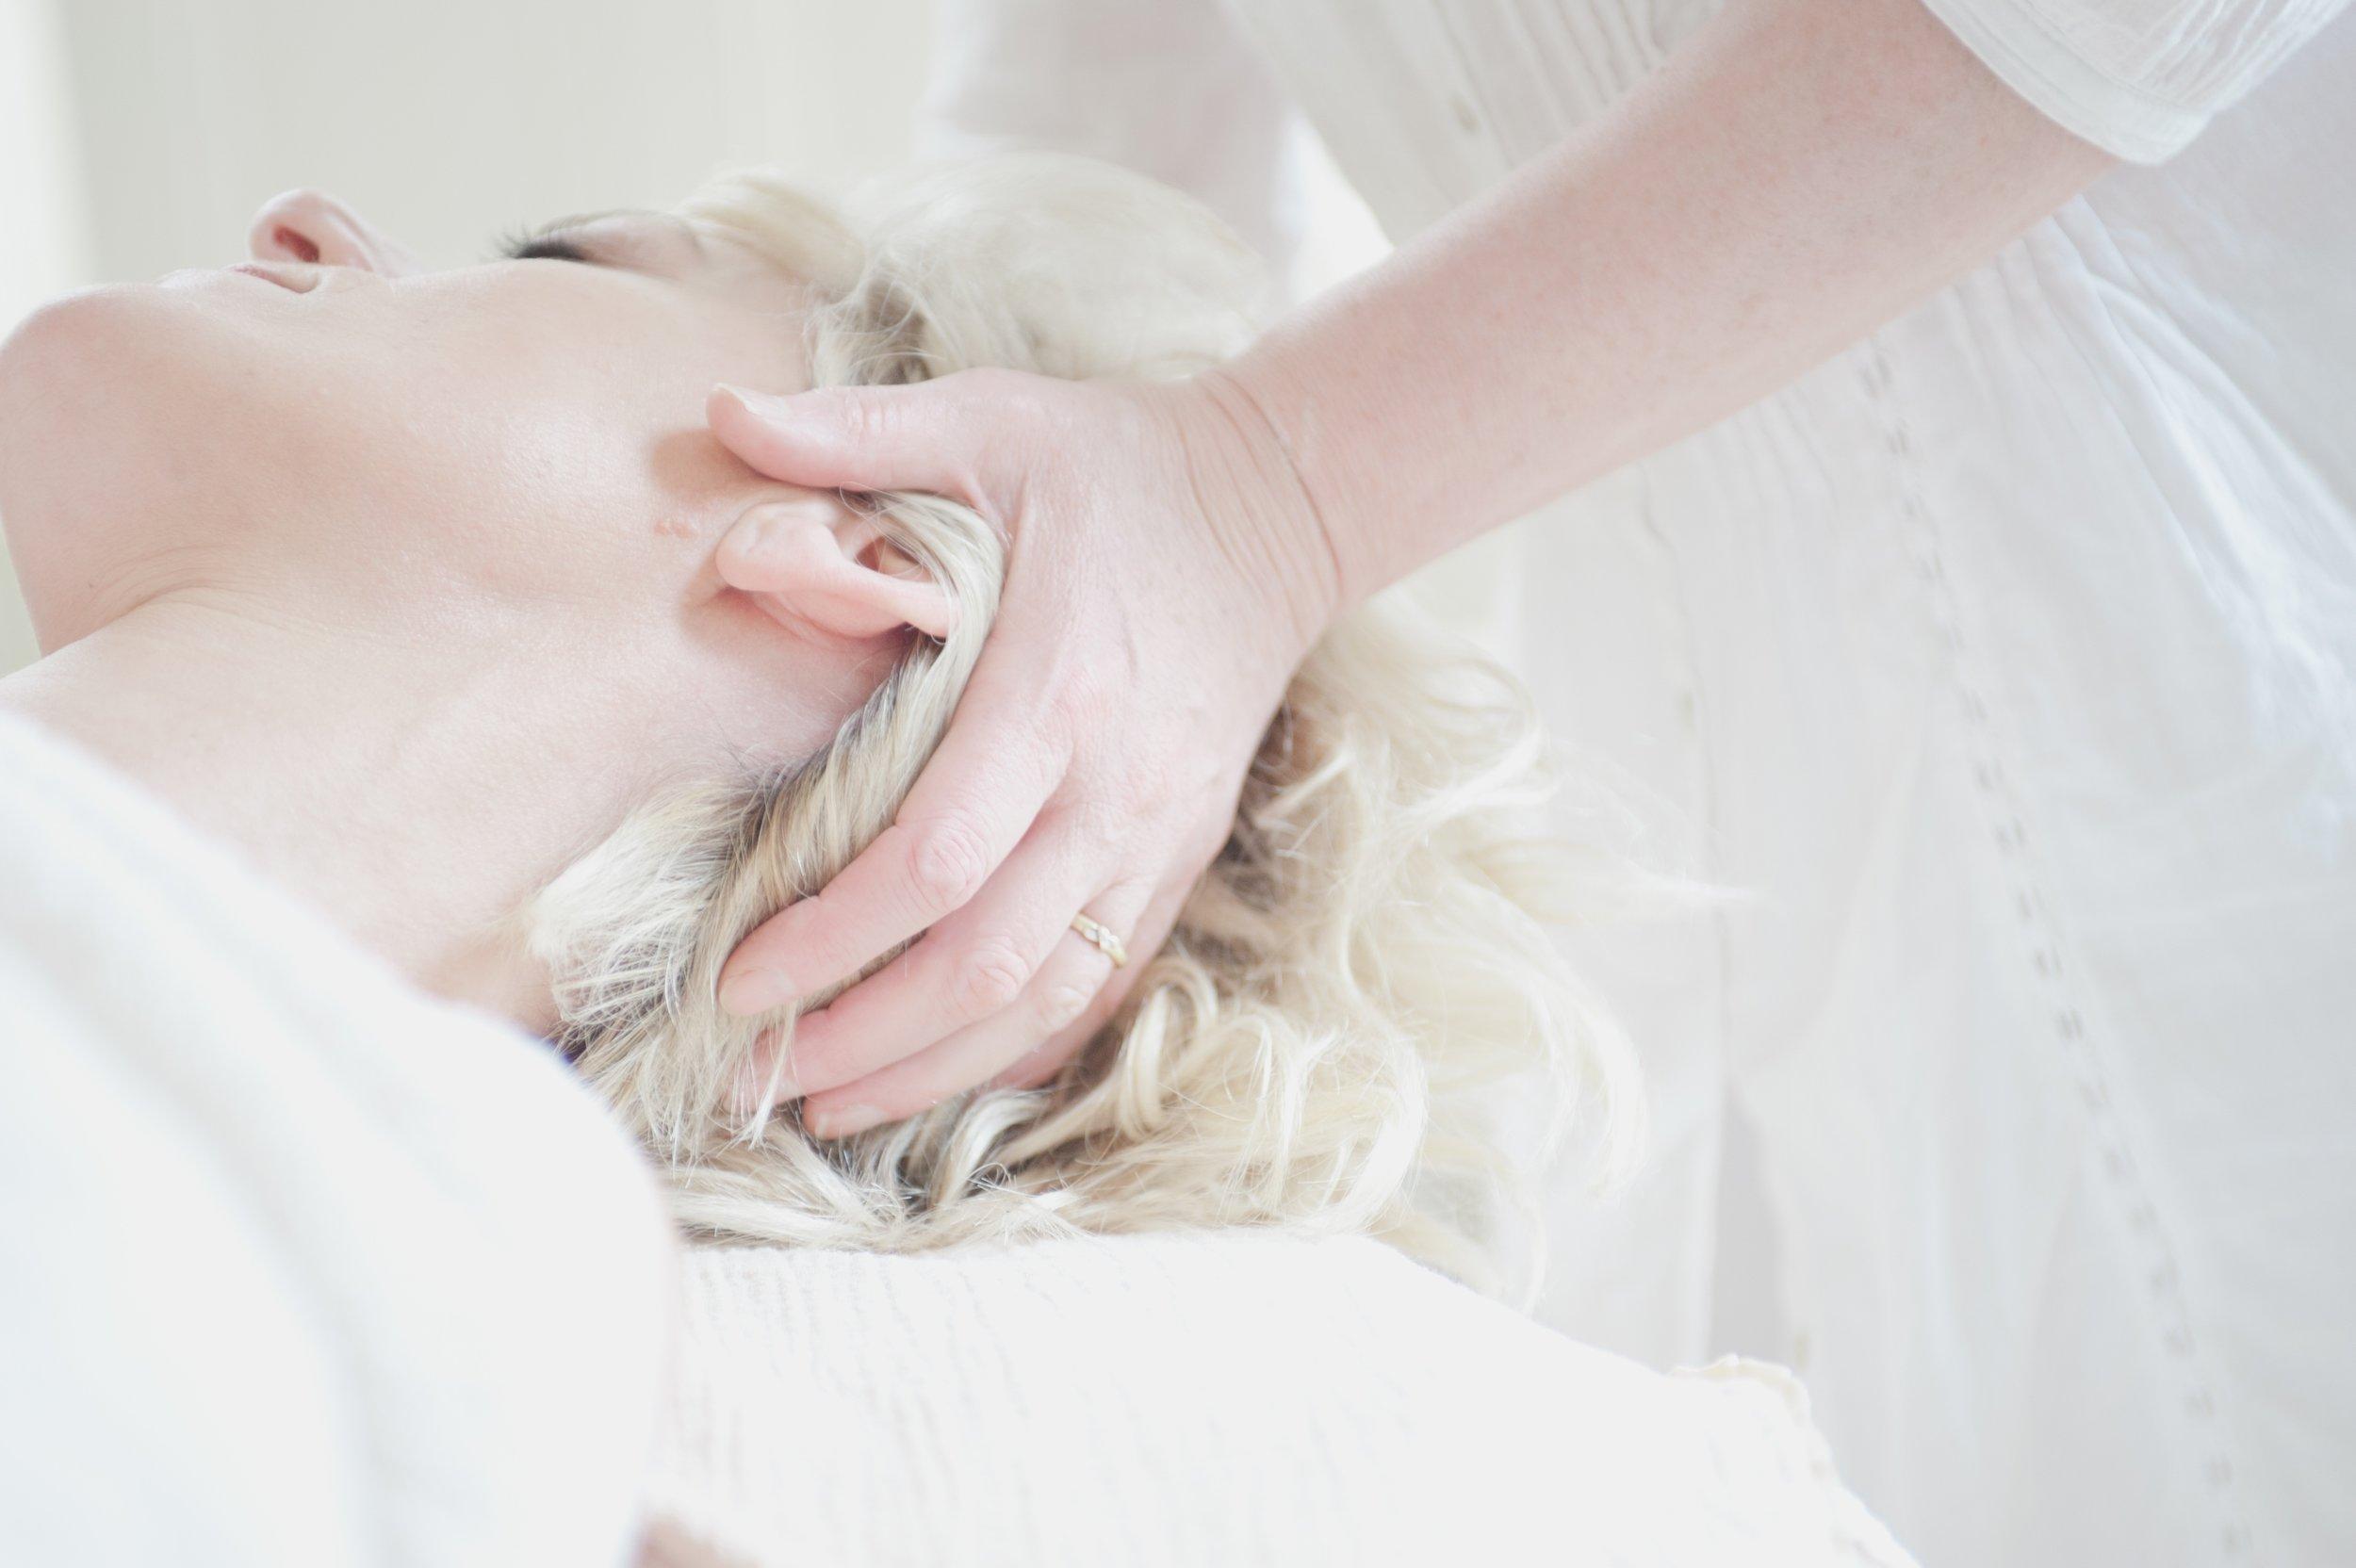 woman-relax-professional-wedding-dress-bride-face-903584-pxhere.com.jpg